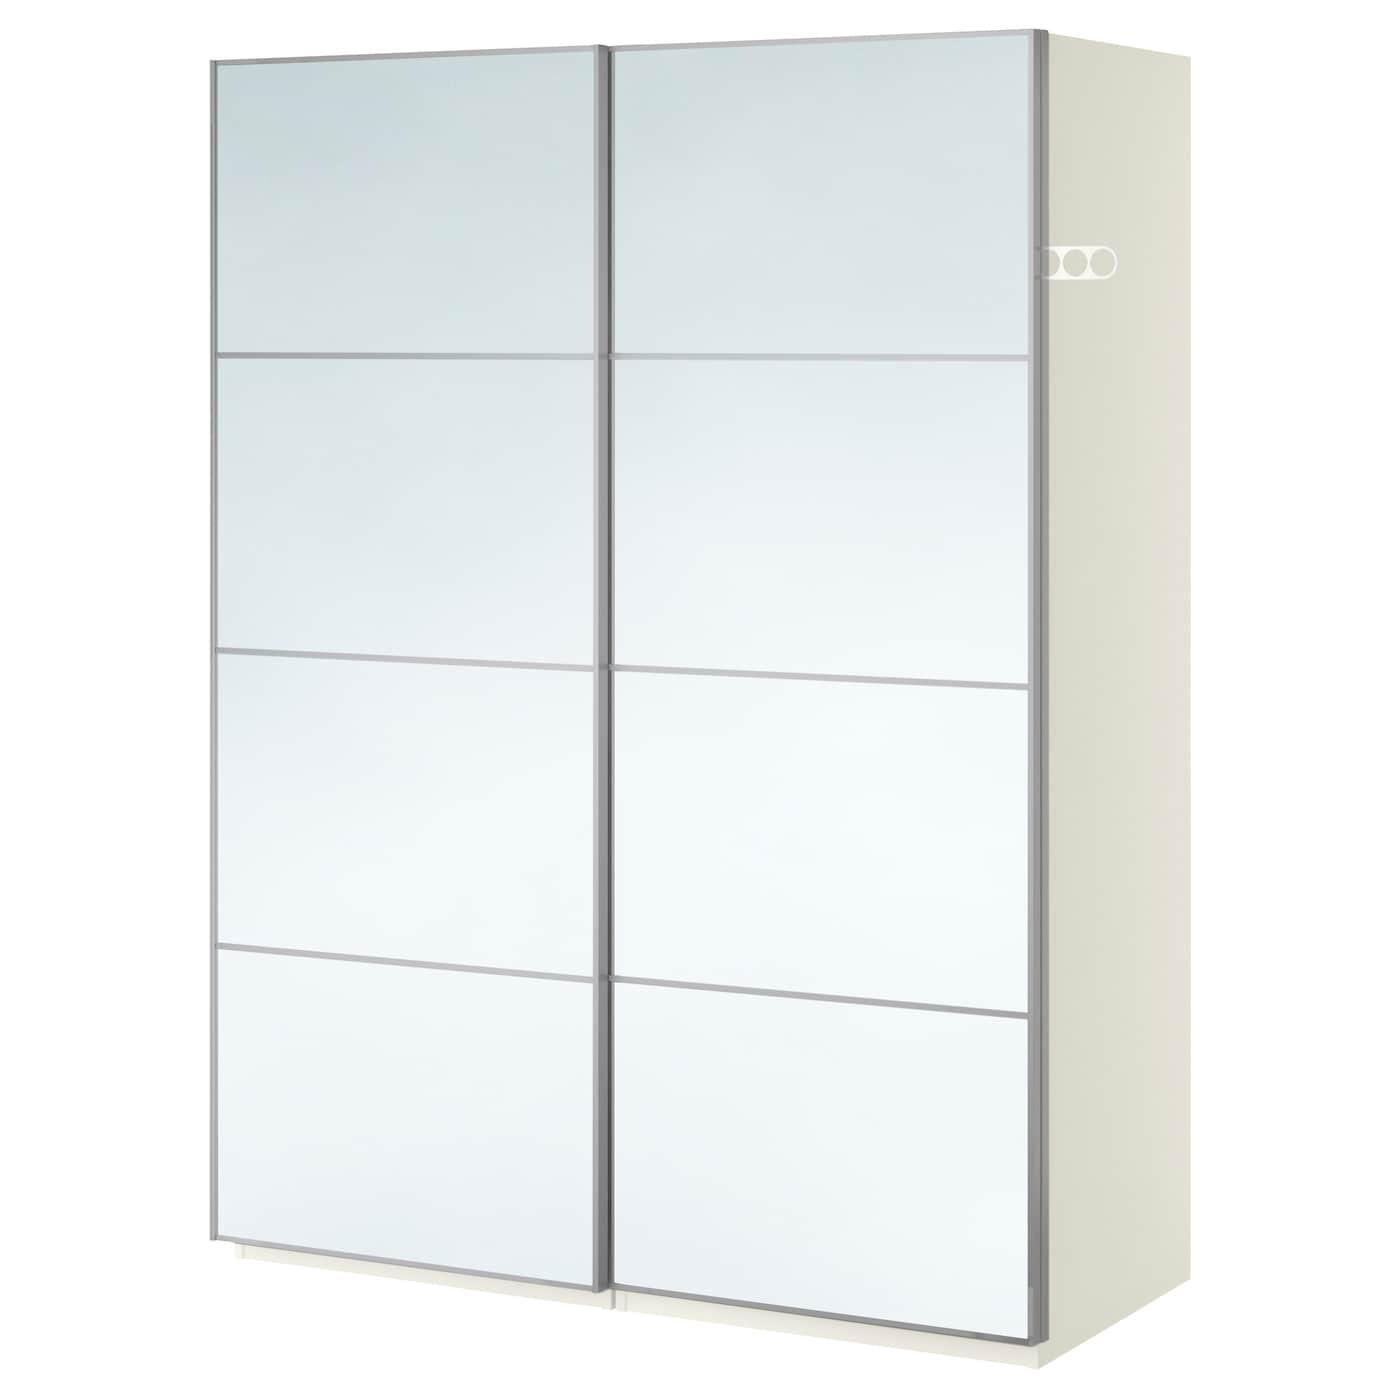 Pax armoire penderie blanc auli miroir 150x66x201 cm ikea - Armoire penderie miroir ...